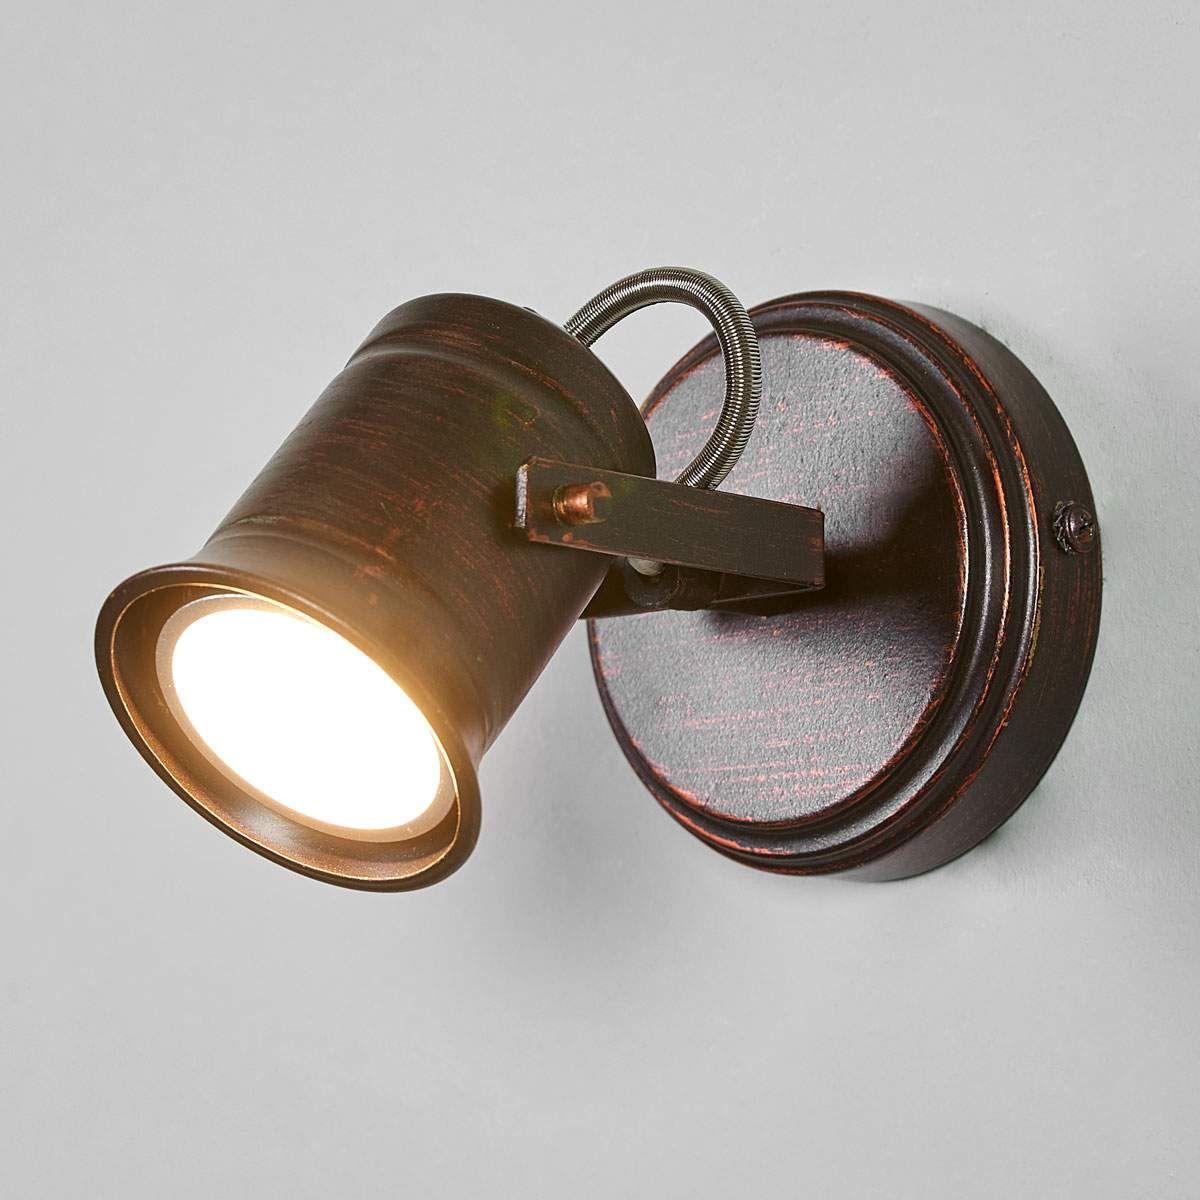 Braun Goldener Spot Cansu Gu10 Led Led Led Spots Und Led Wandlampen